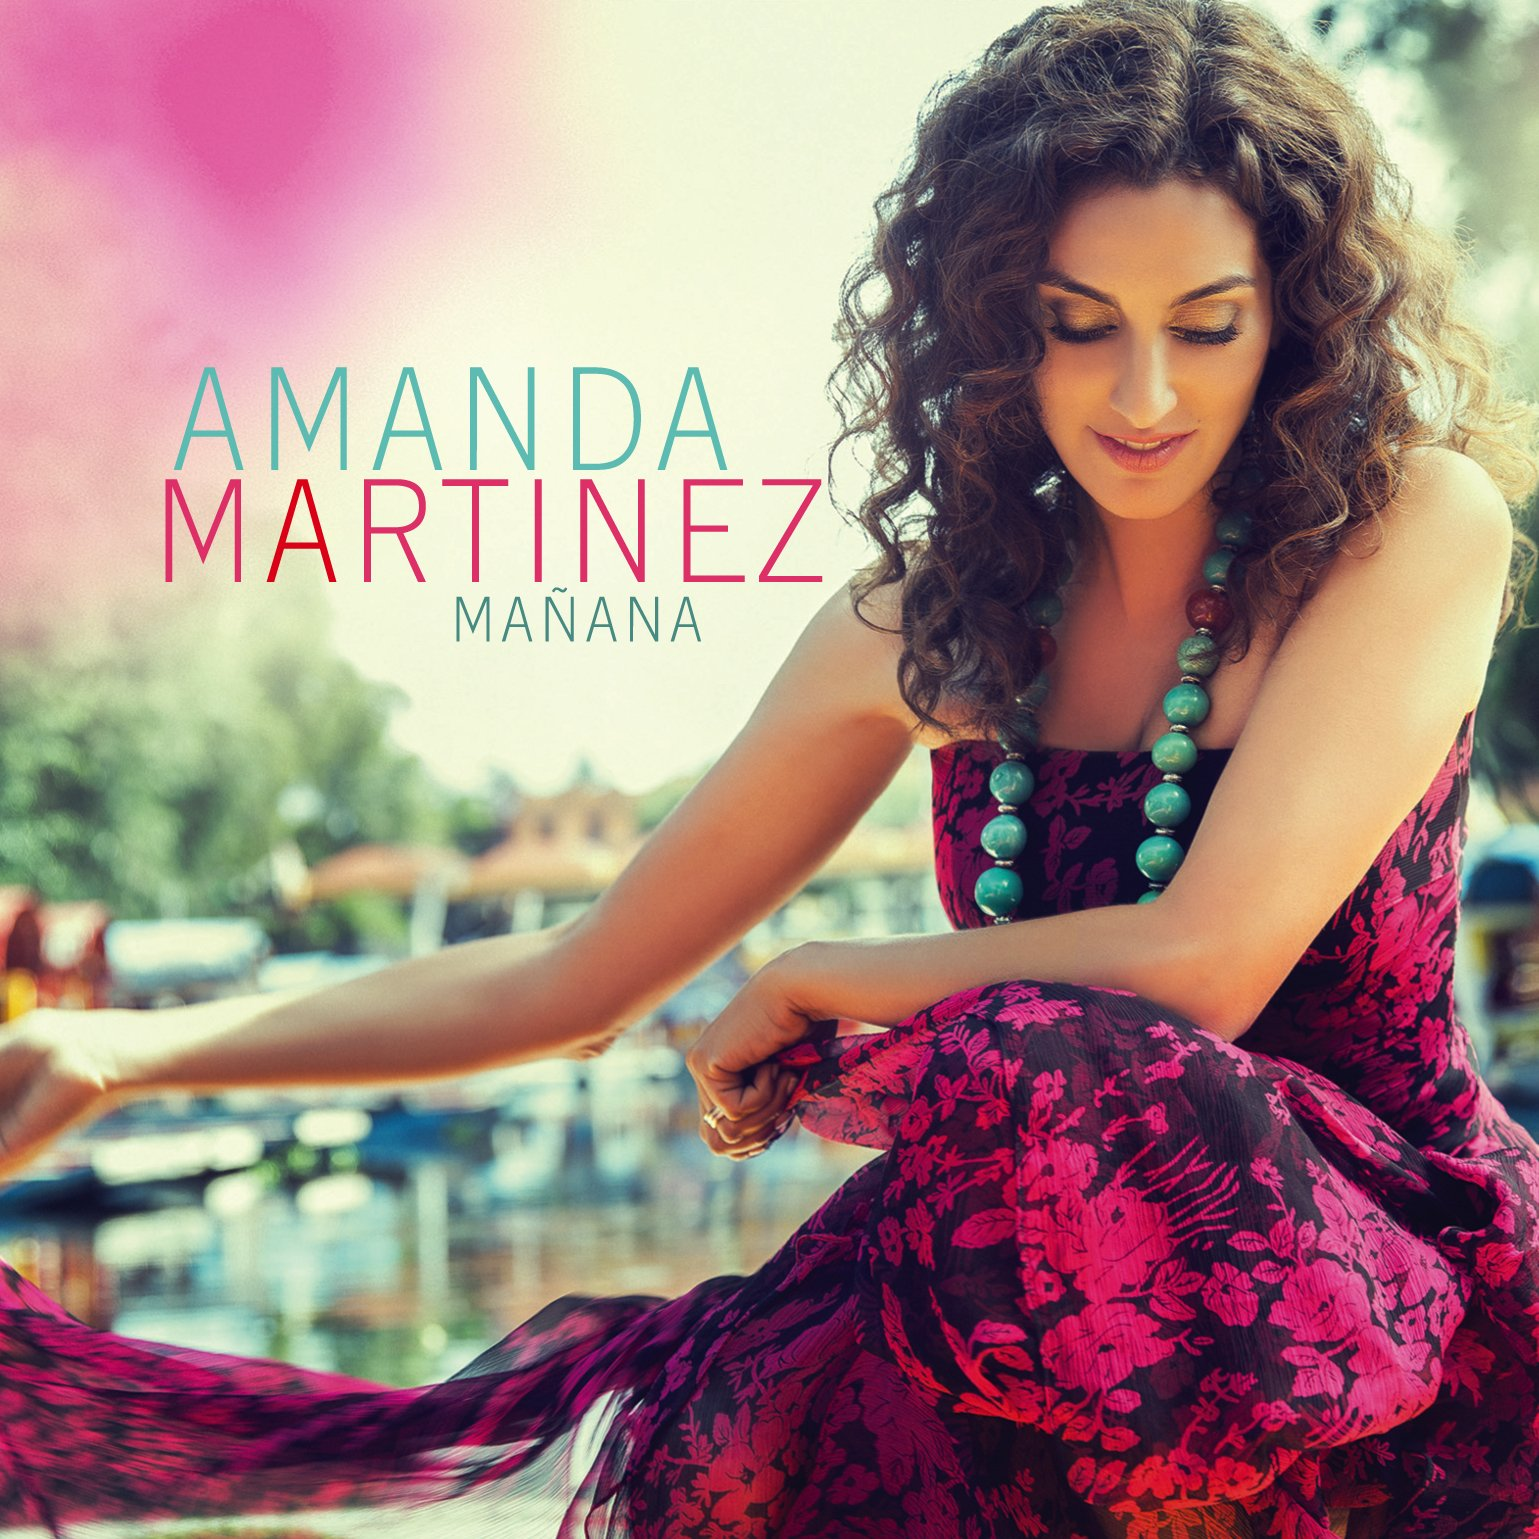 CD : Amanda Martinez - Manana (CD)